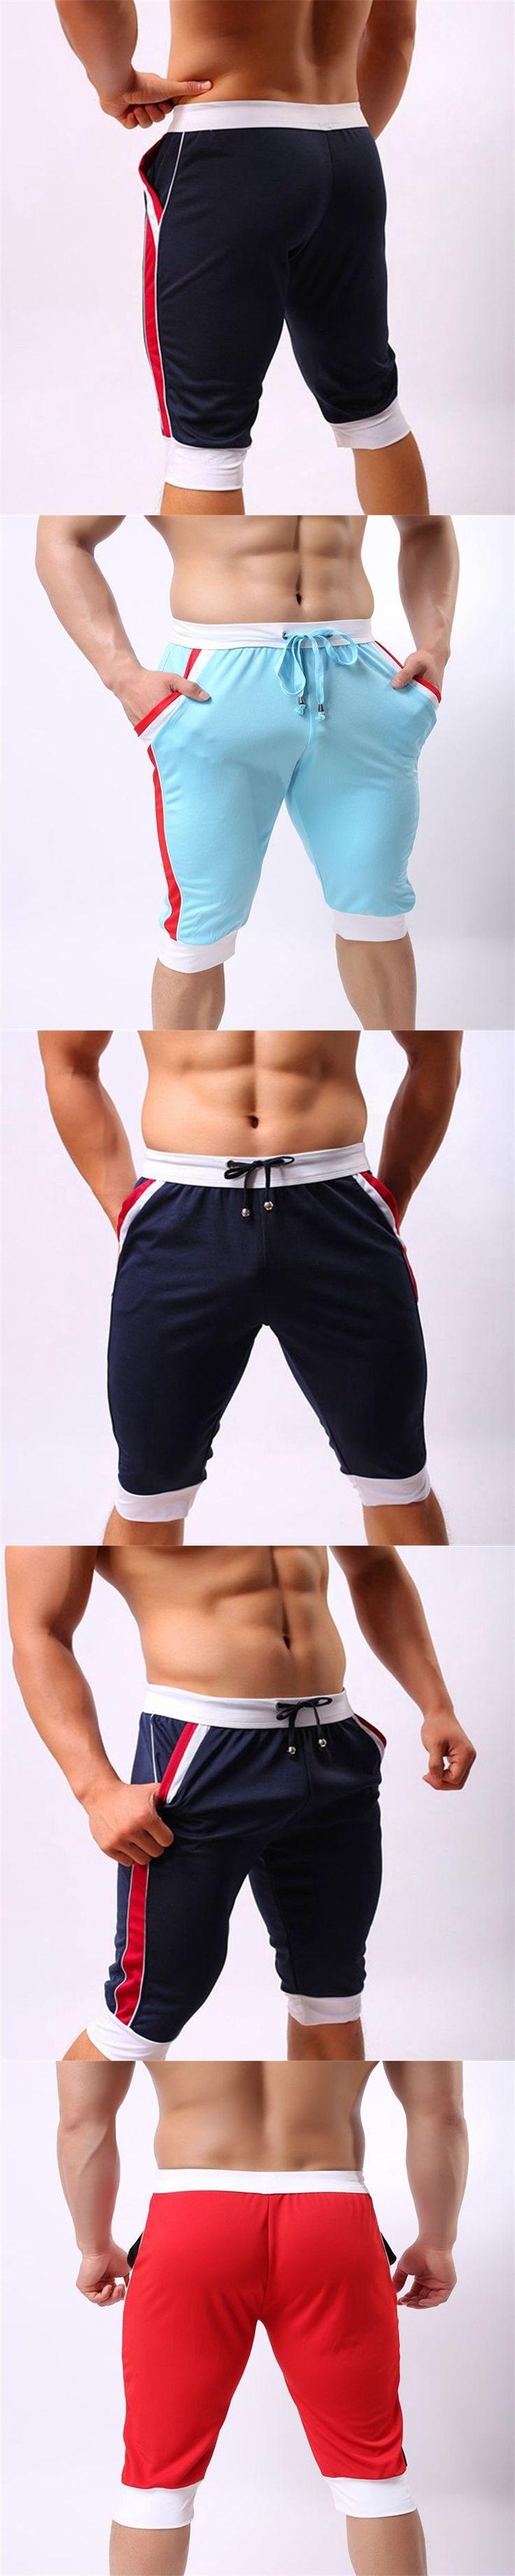 Mens Capri Pants Mens Joggers Summer Casual Trousers Slim Fit Elastic Waist White Navy Blue Casual Harem Pants Men Sportswear